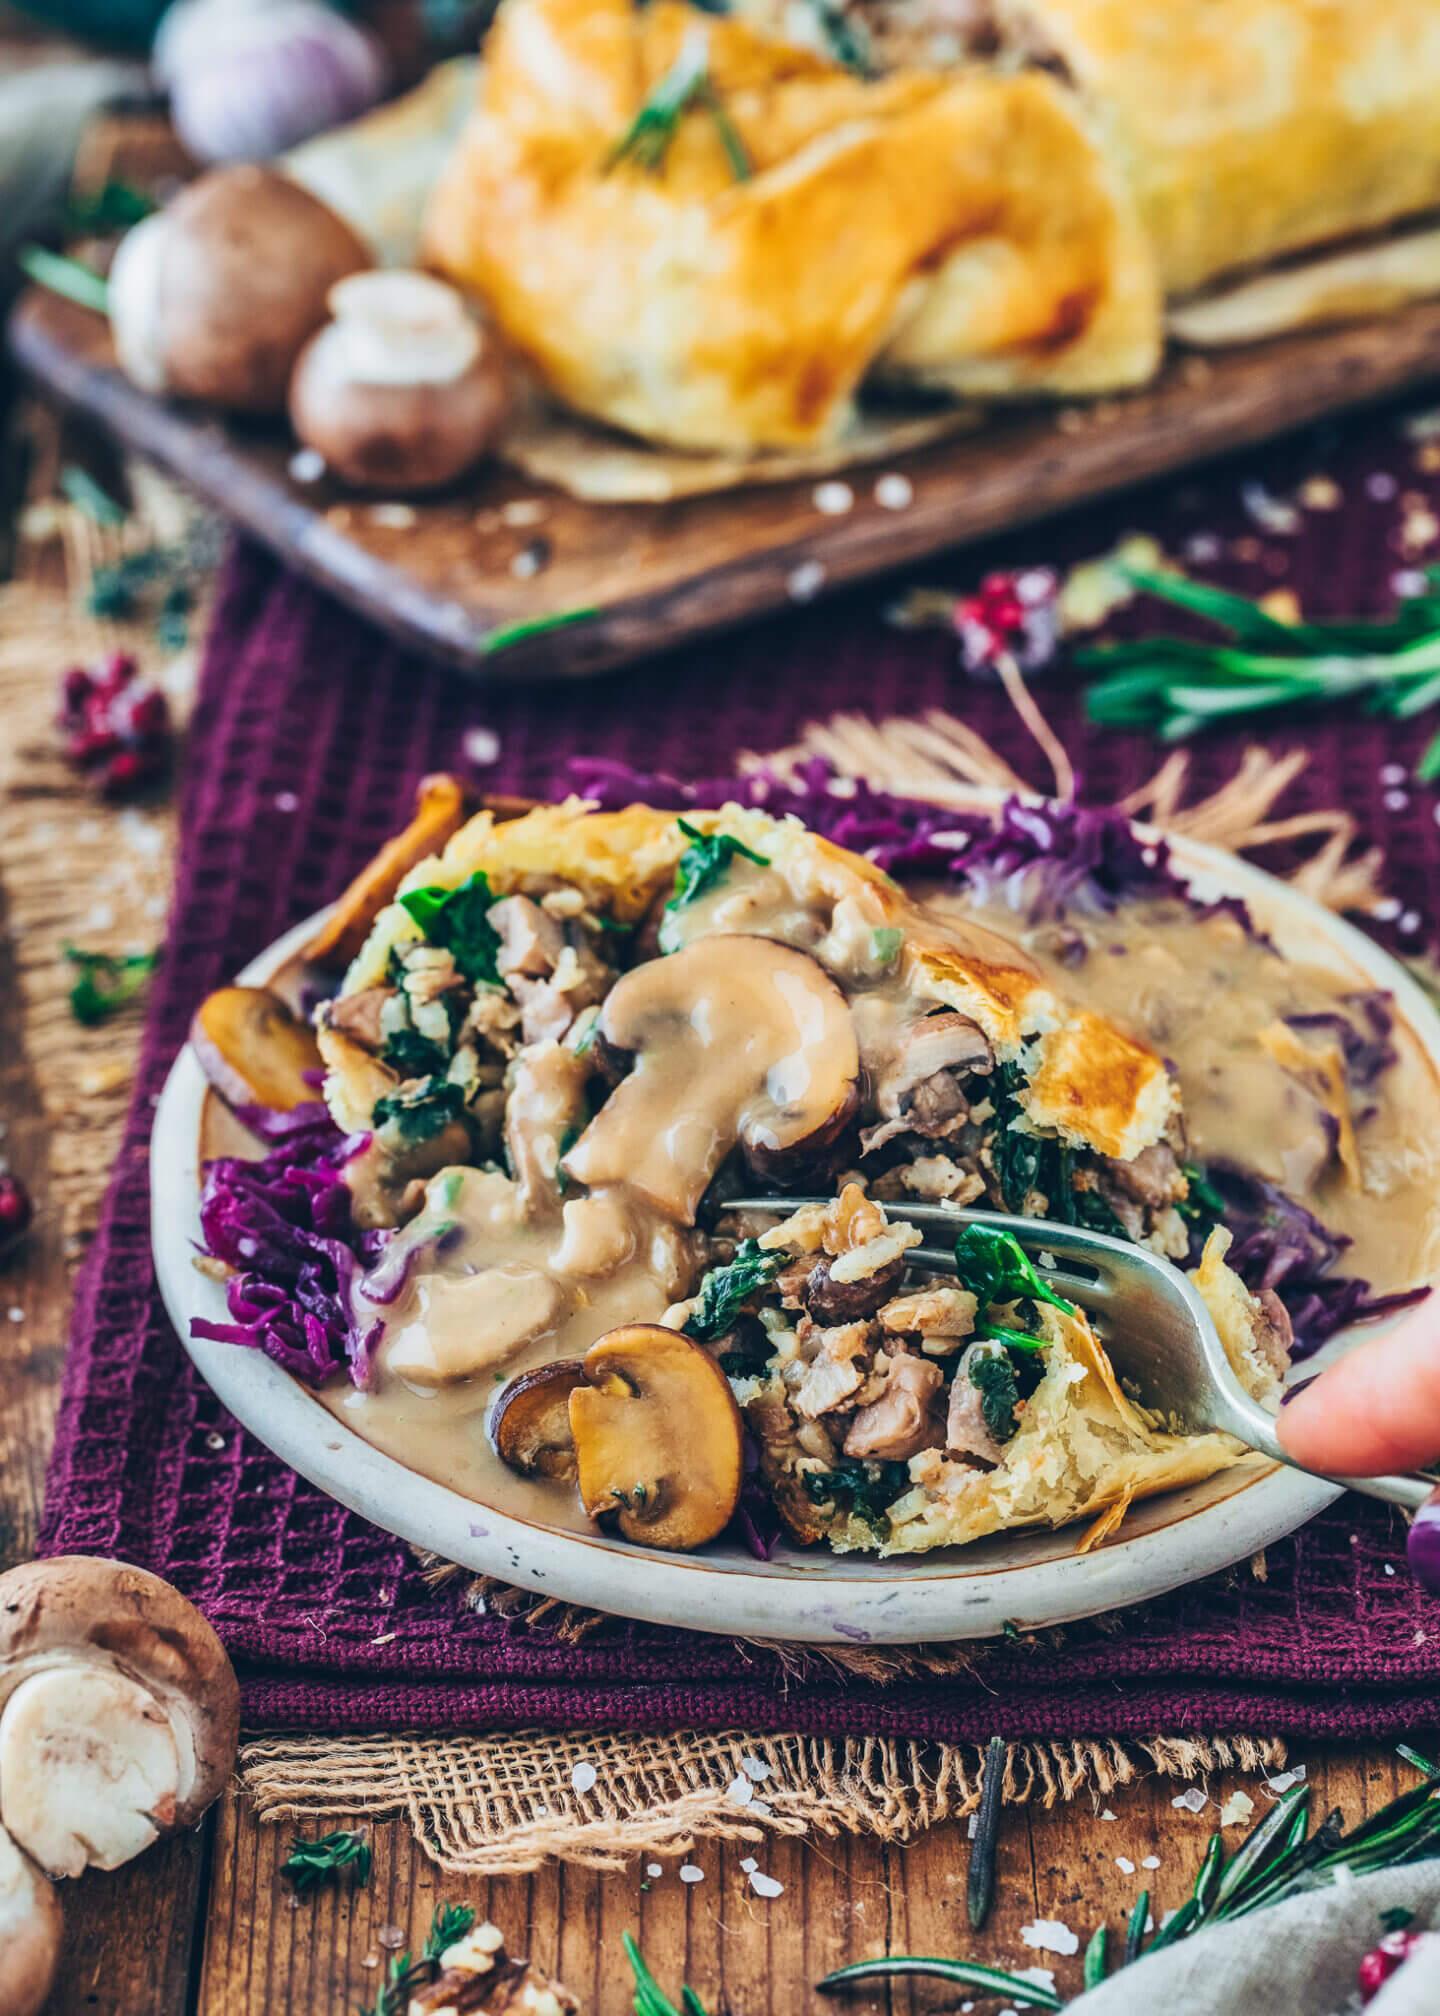 Mushroom Wellington with Braised Red Cabbage and Vegan Gravy